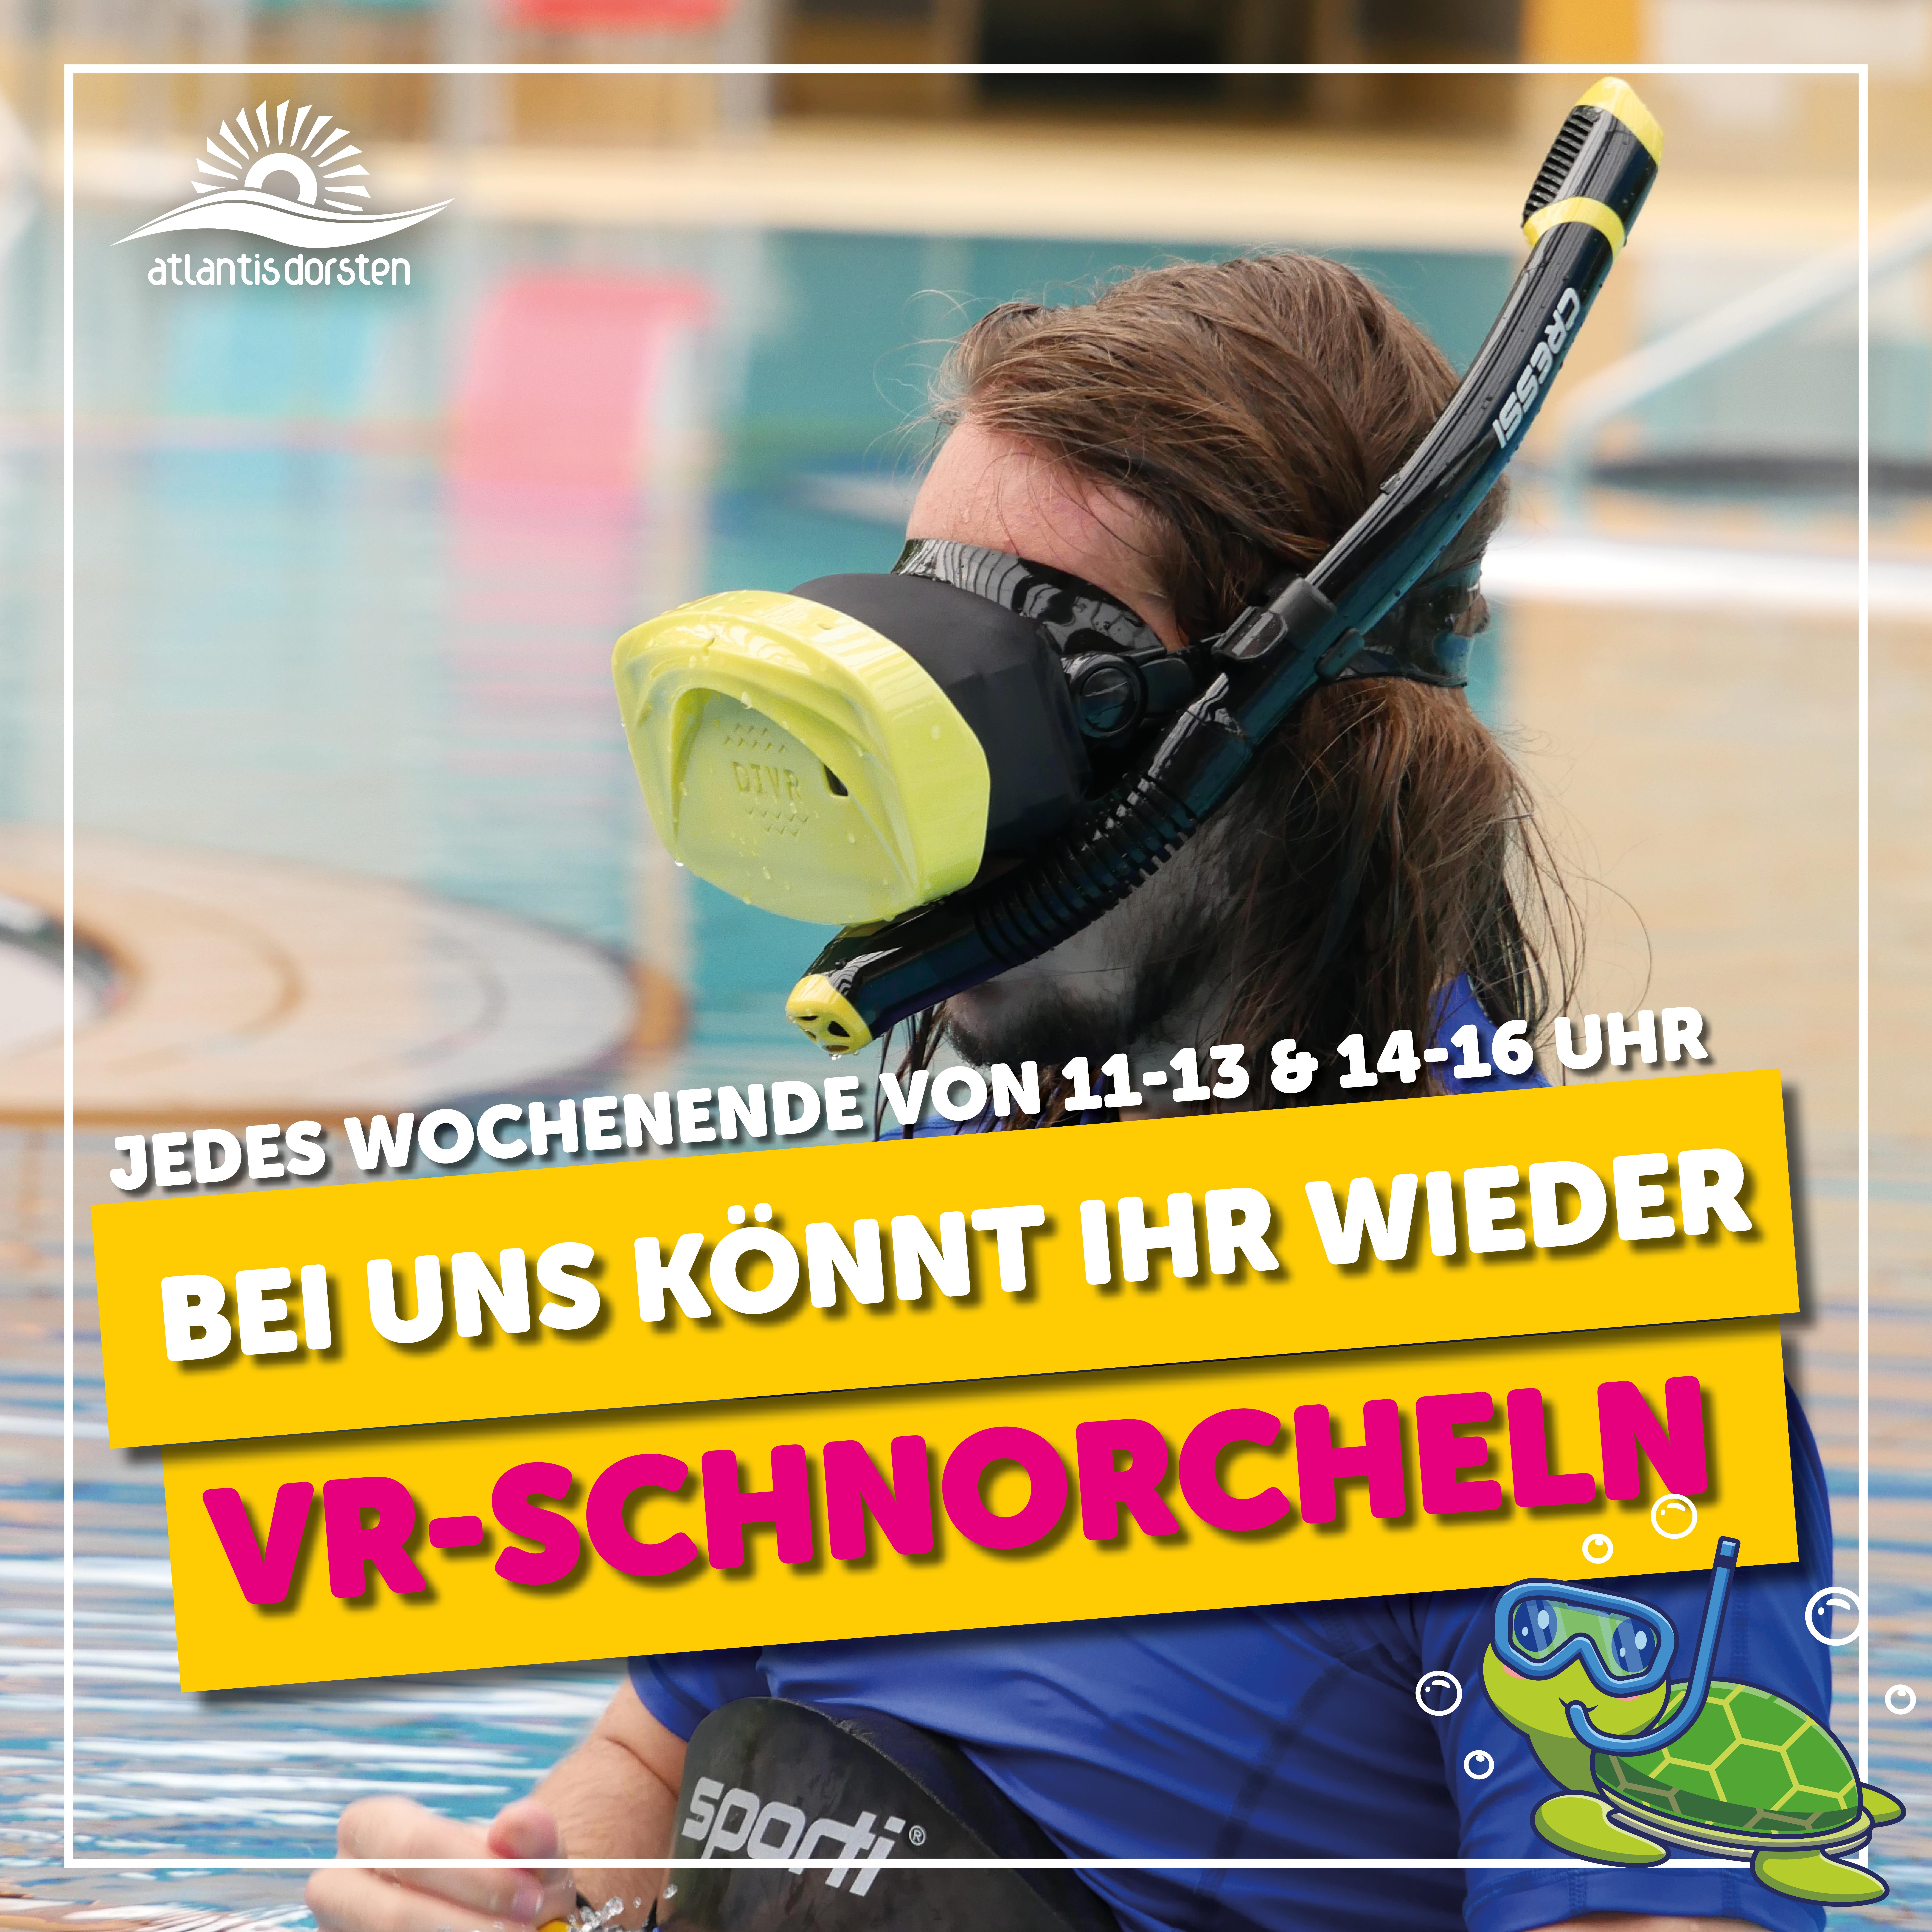 VR-Schnorcheln